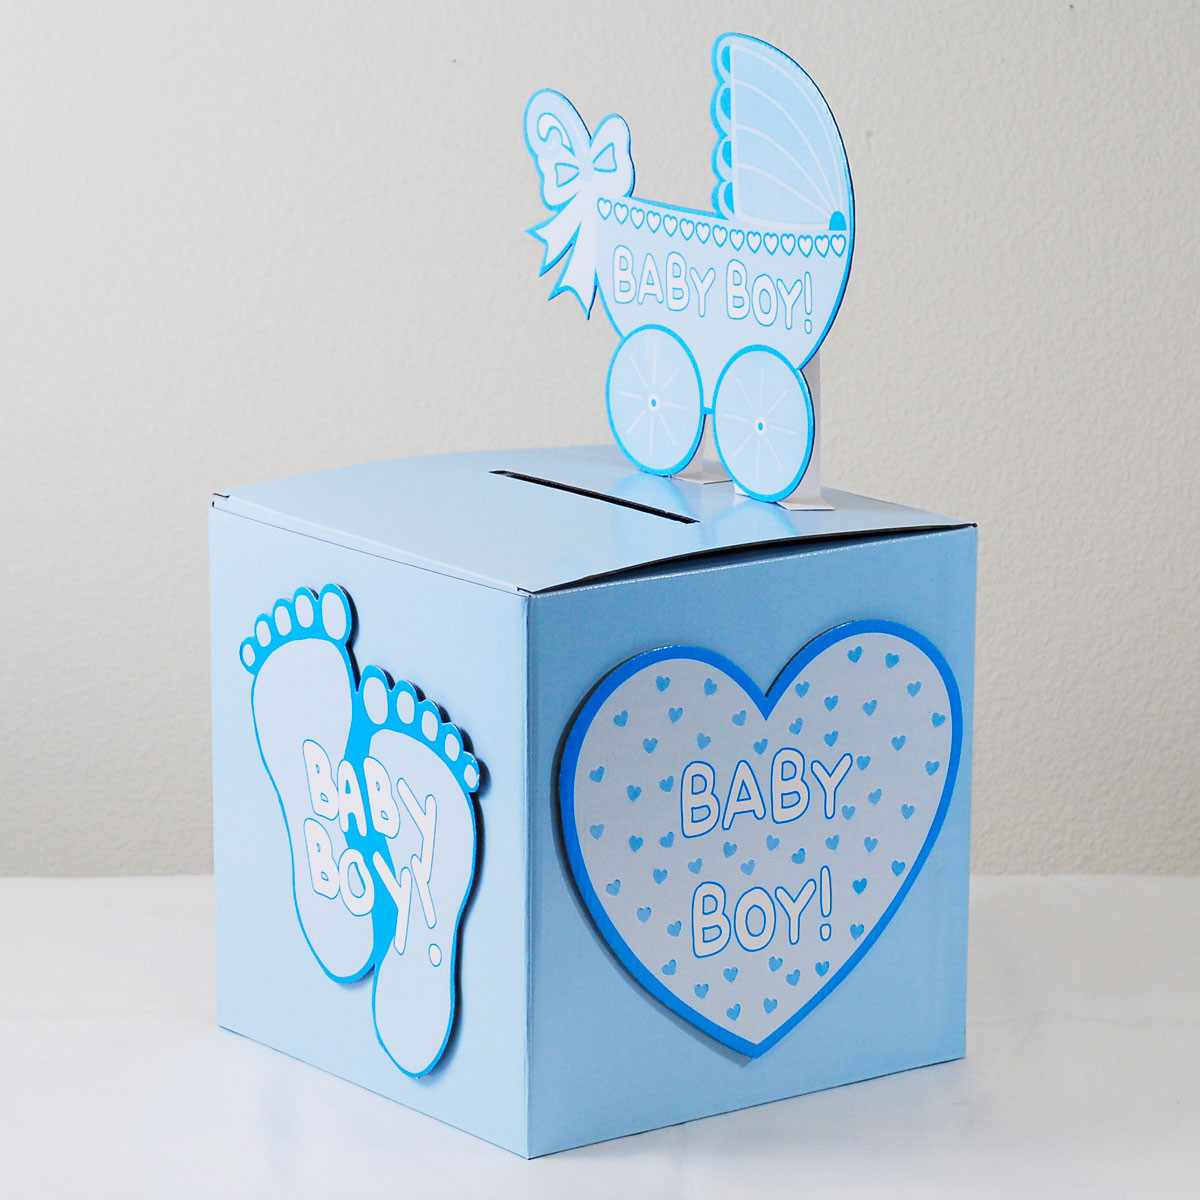 Baby Shower Wishing Well Gift Ideas  Baby Shower Wishing Well Card Gift Money Box Pink Girl